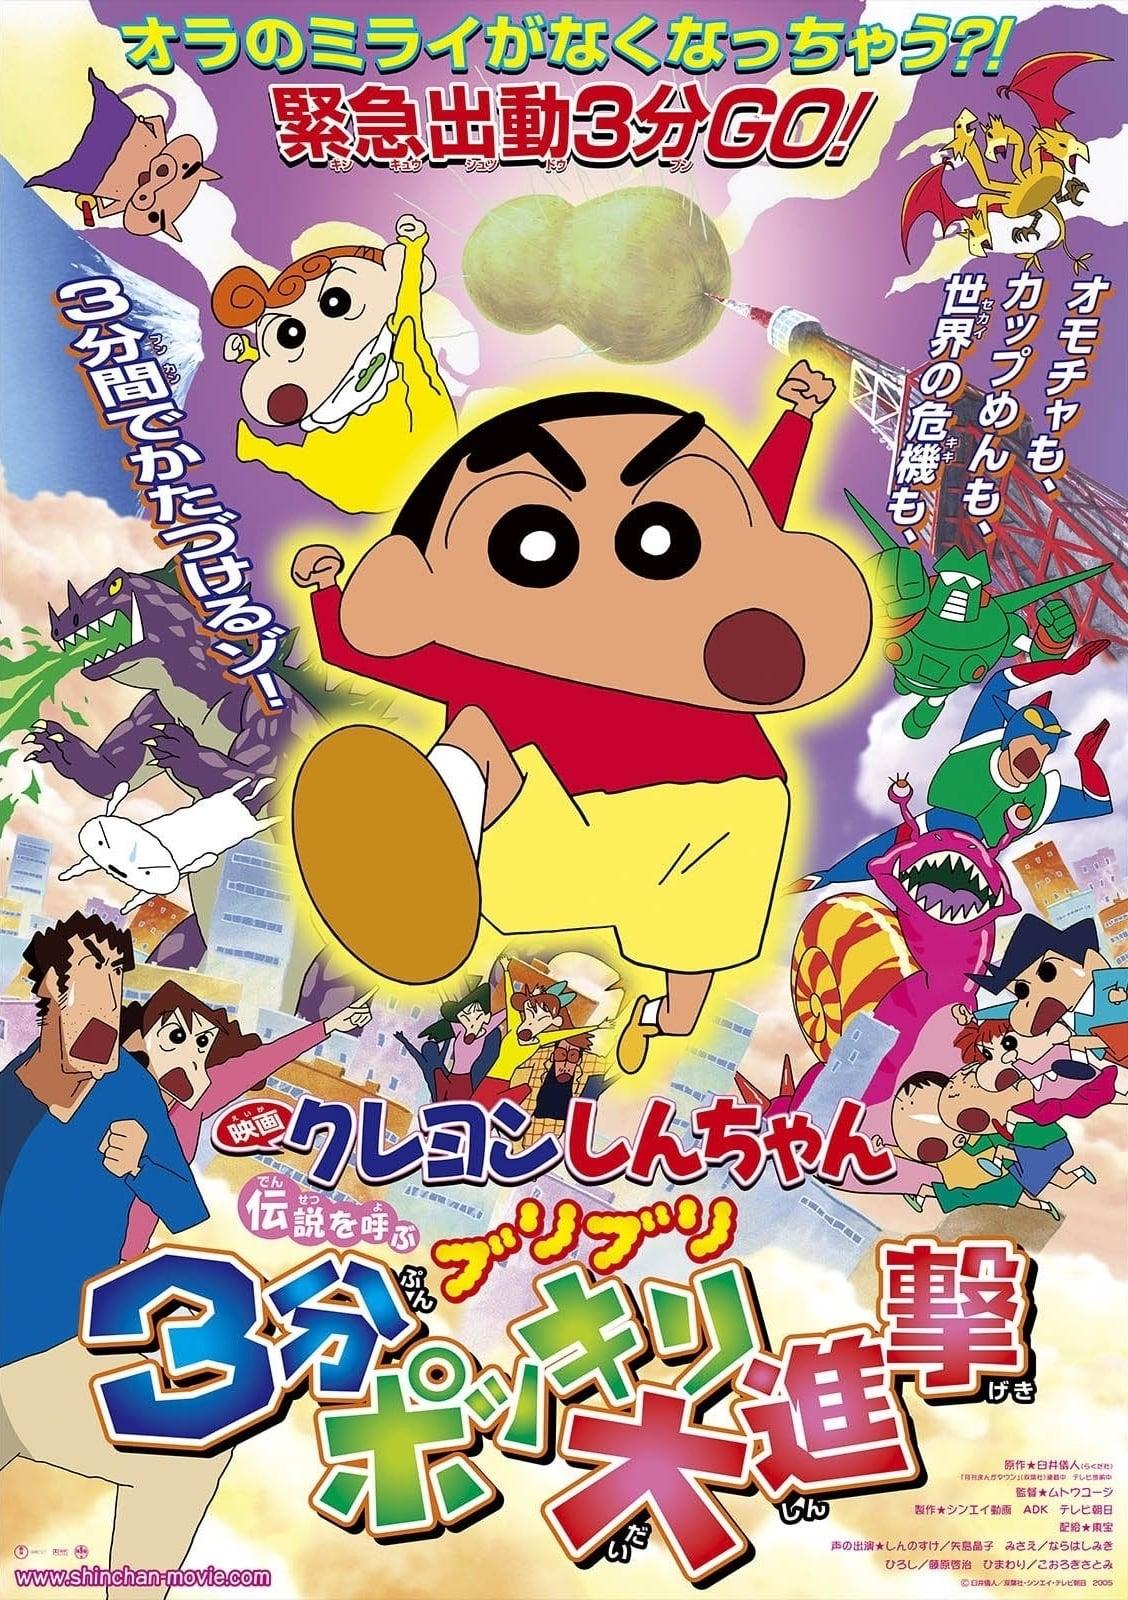 Crayon Shin-chan: The Legend Called Buri Buri 3 Minutes Charge (2005)